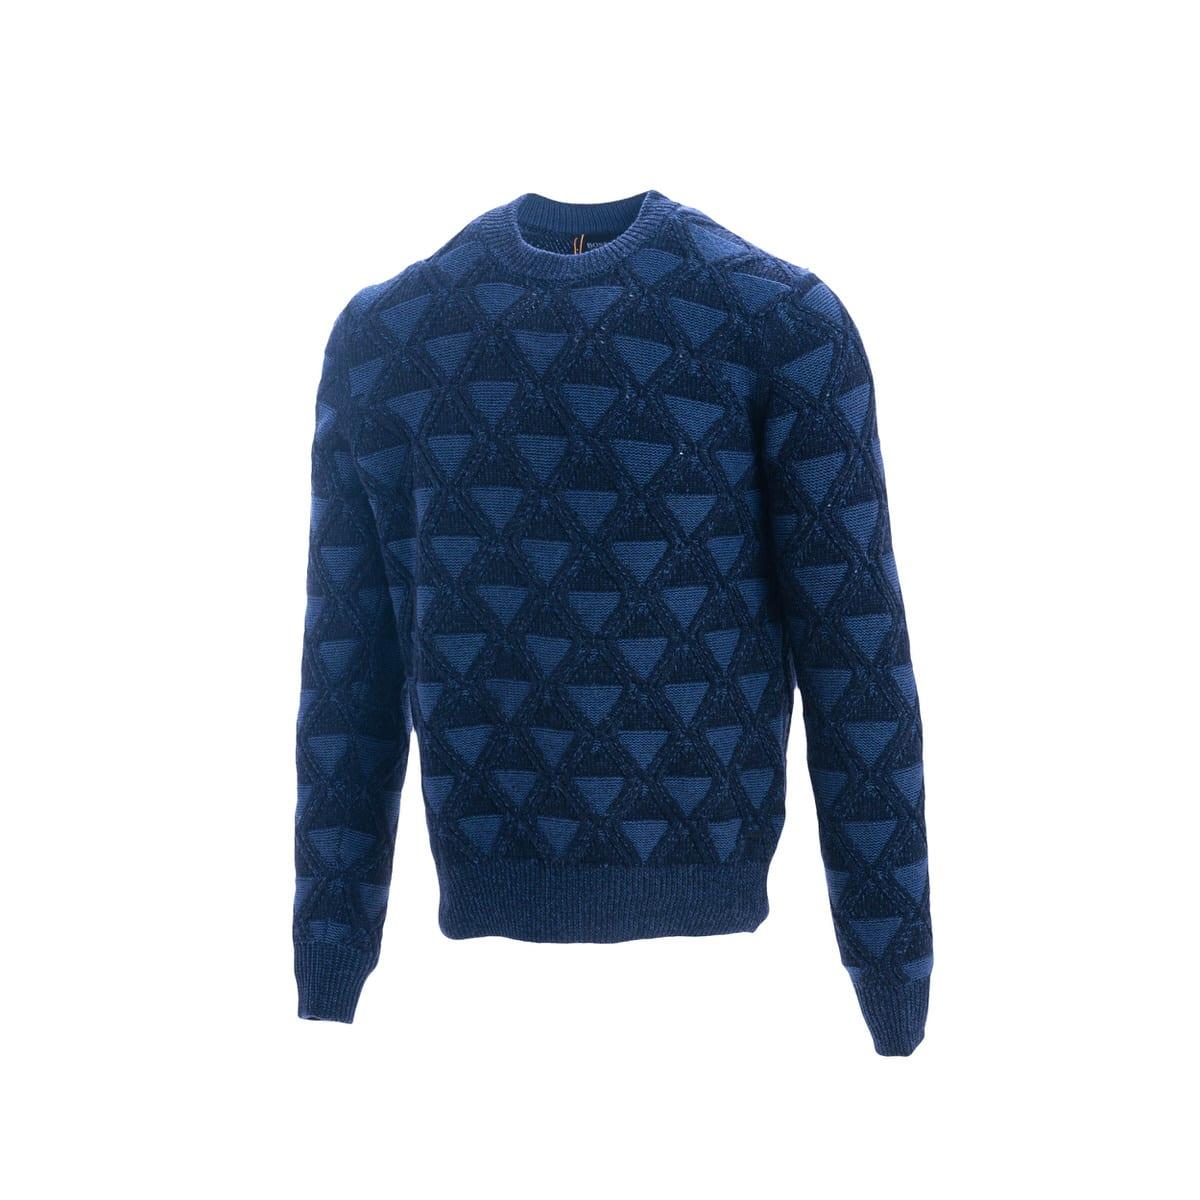 Boss Cotton And Wool Sweater